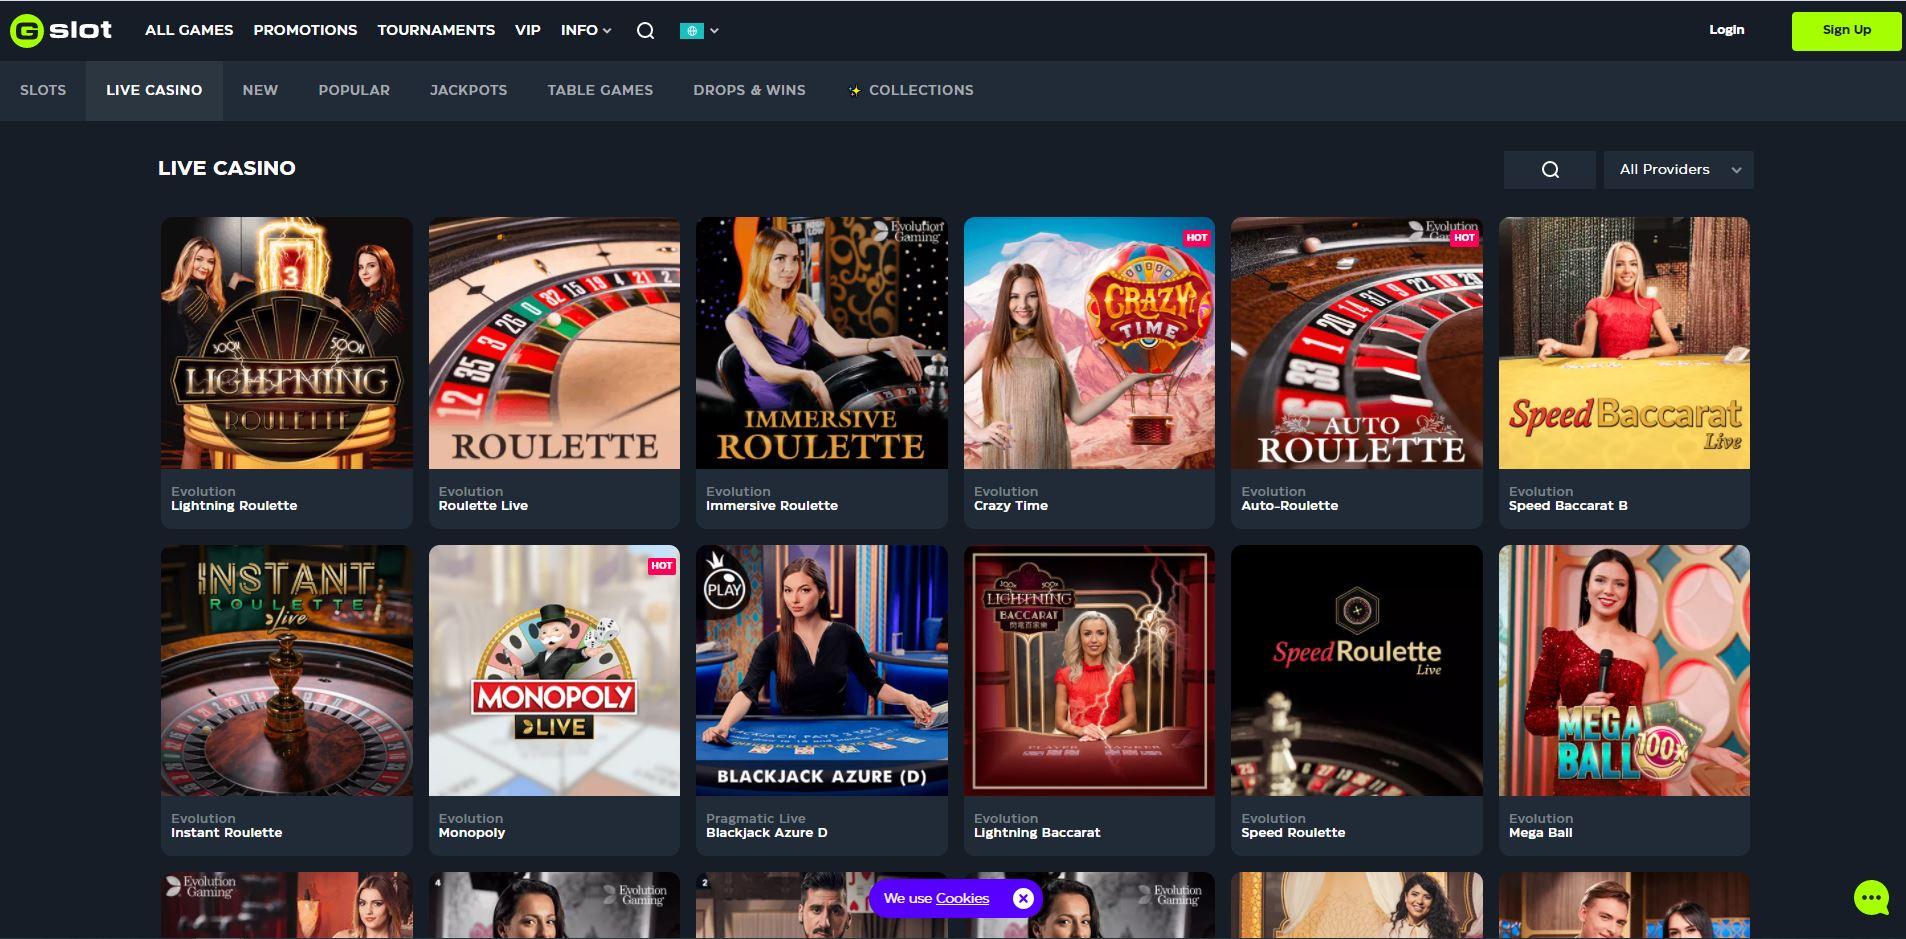 Gslot Casino Live Games Screenshot